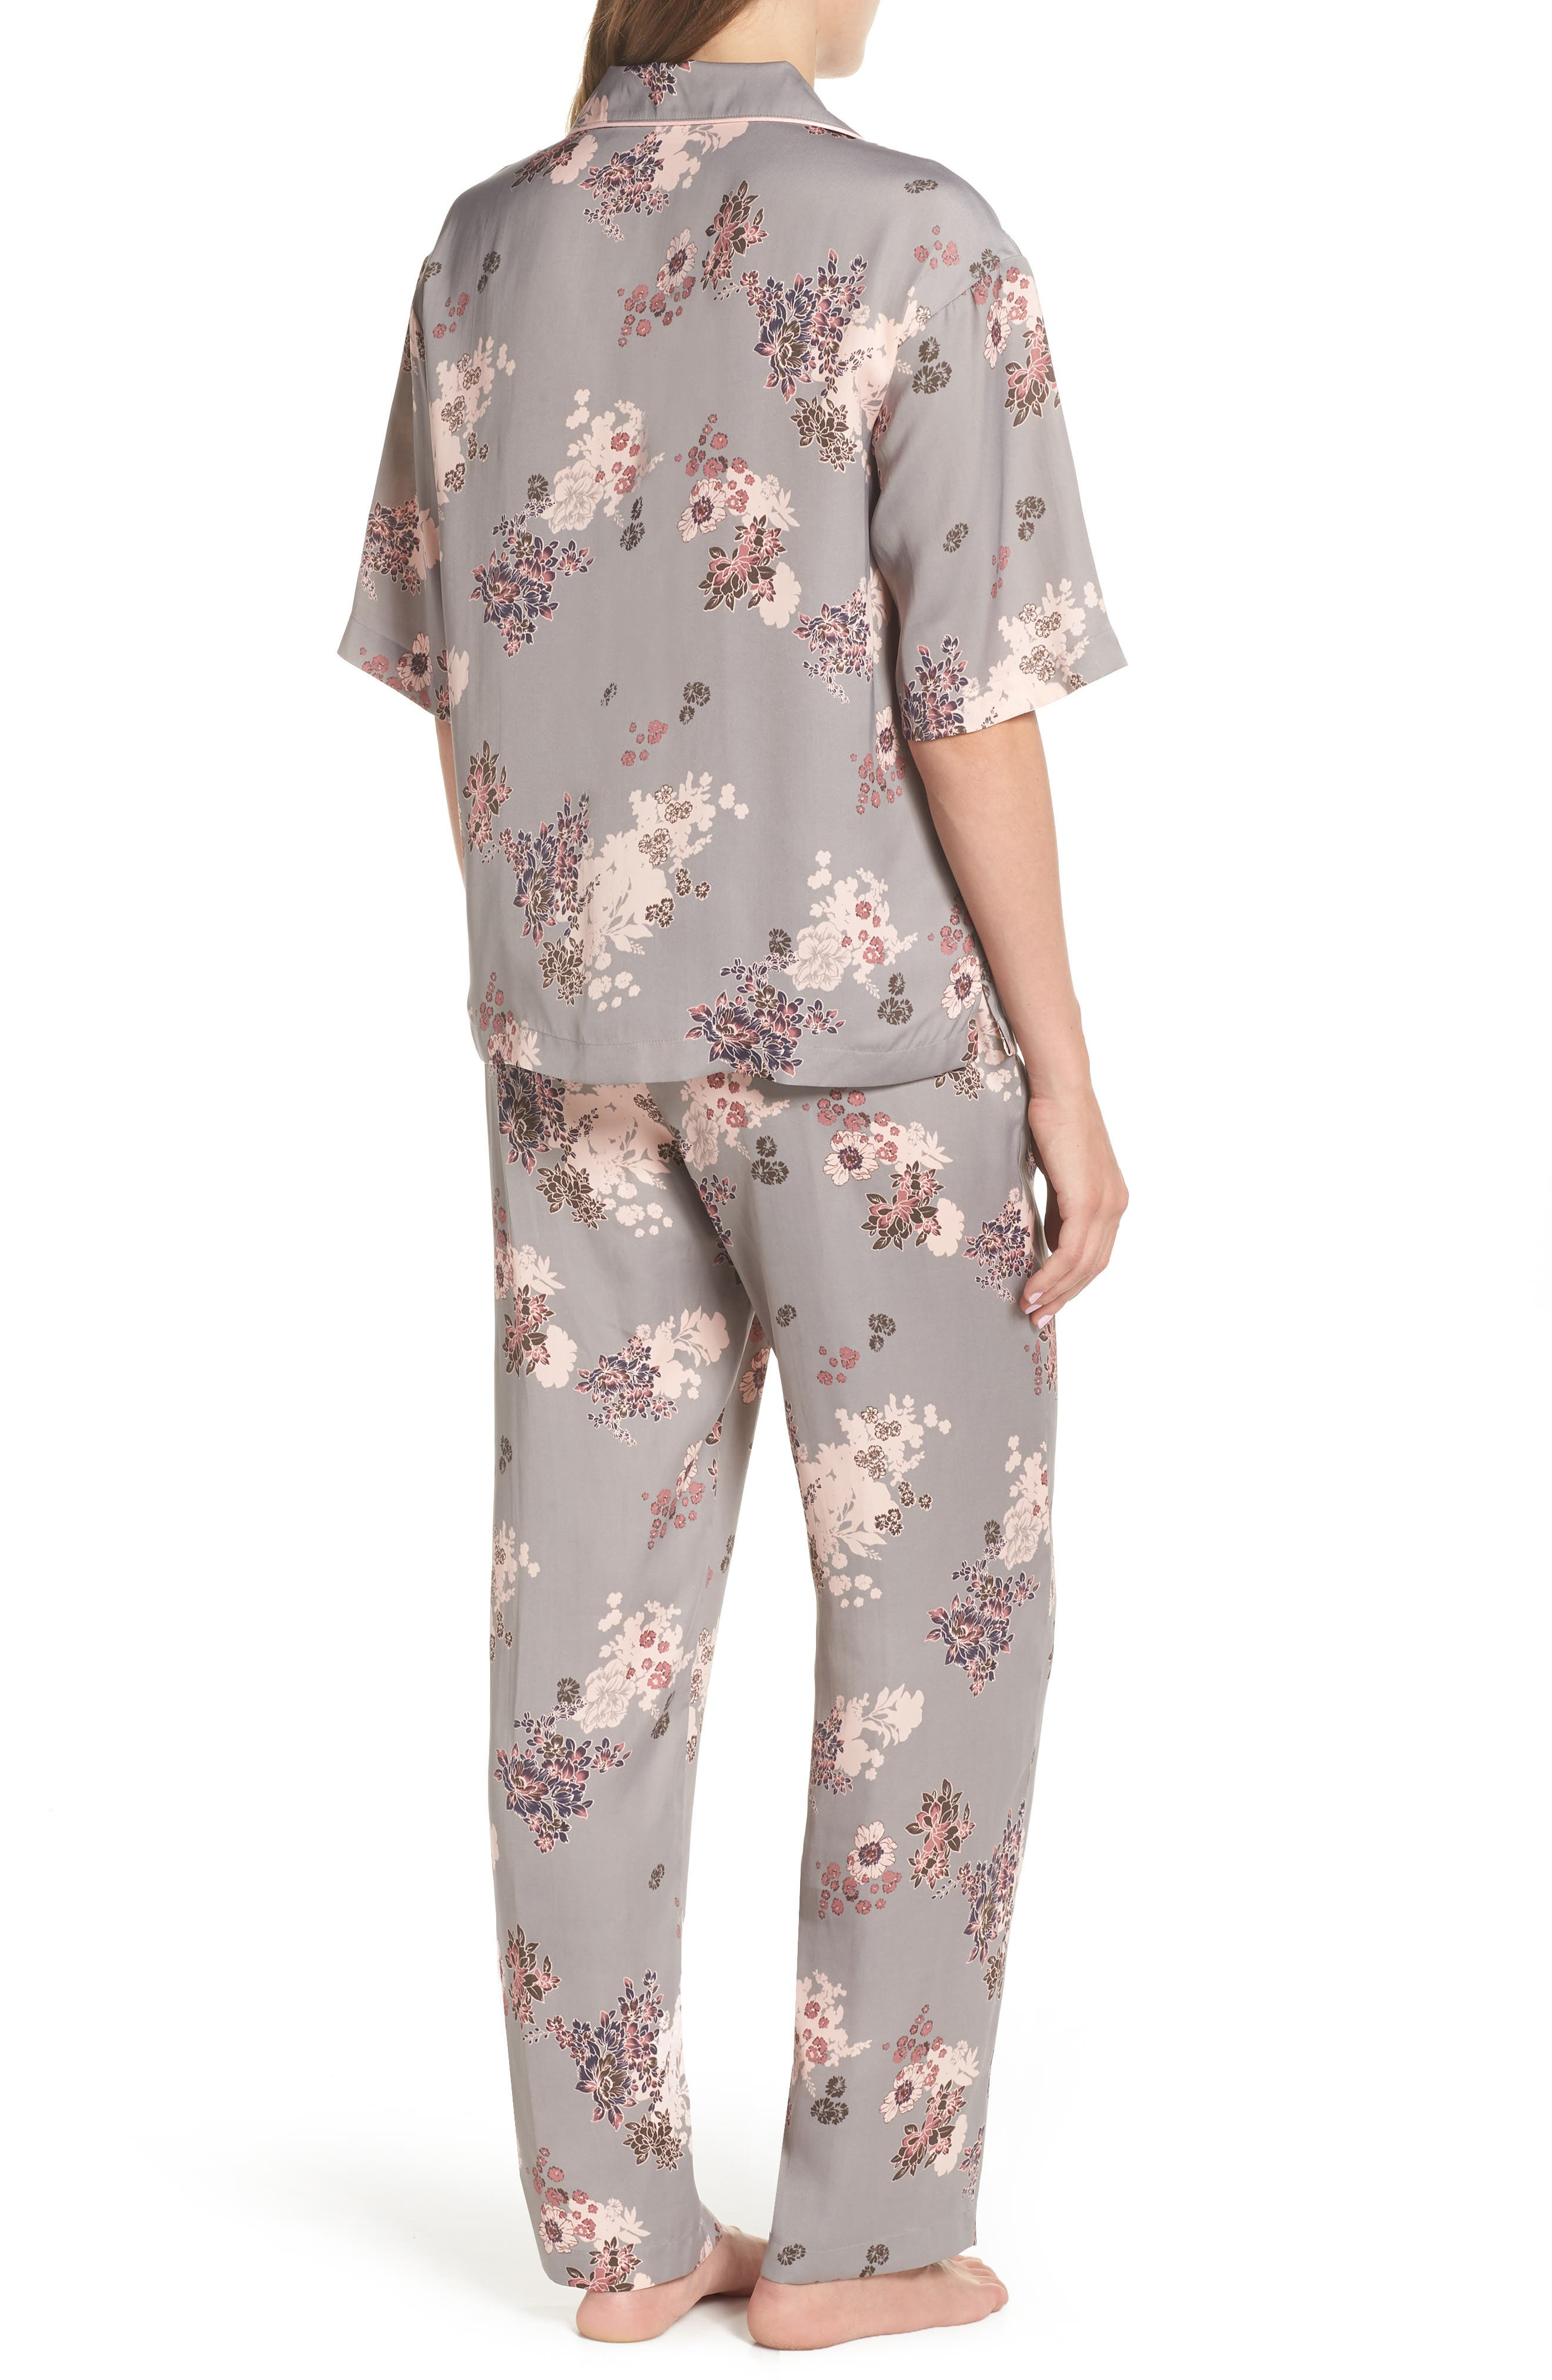 NORDSTROM LINGERIE,                             Matte Satin Pajamas,                             Alternate thumbnail 2, color,                             030